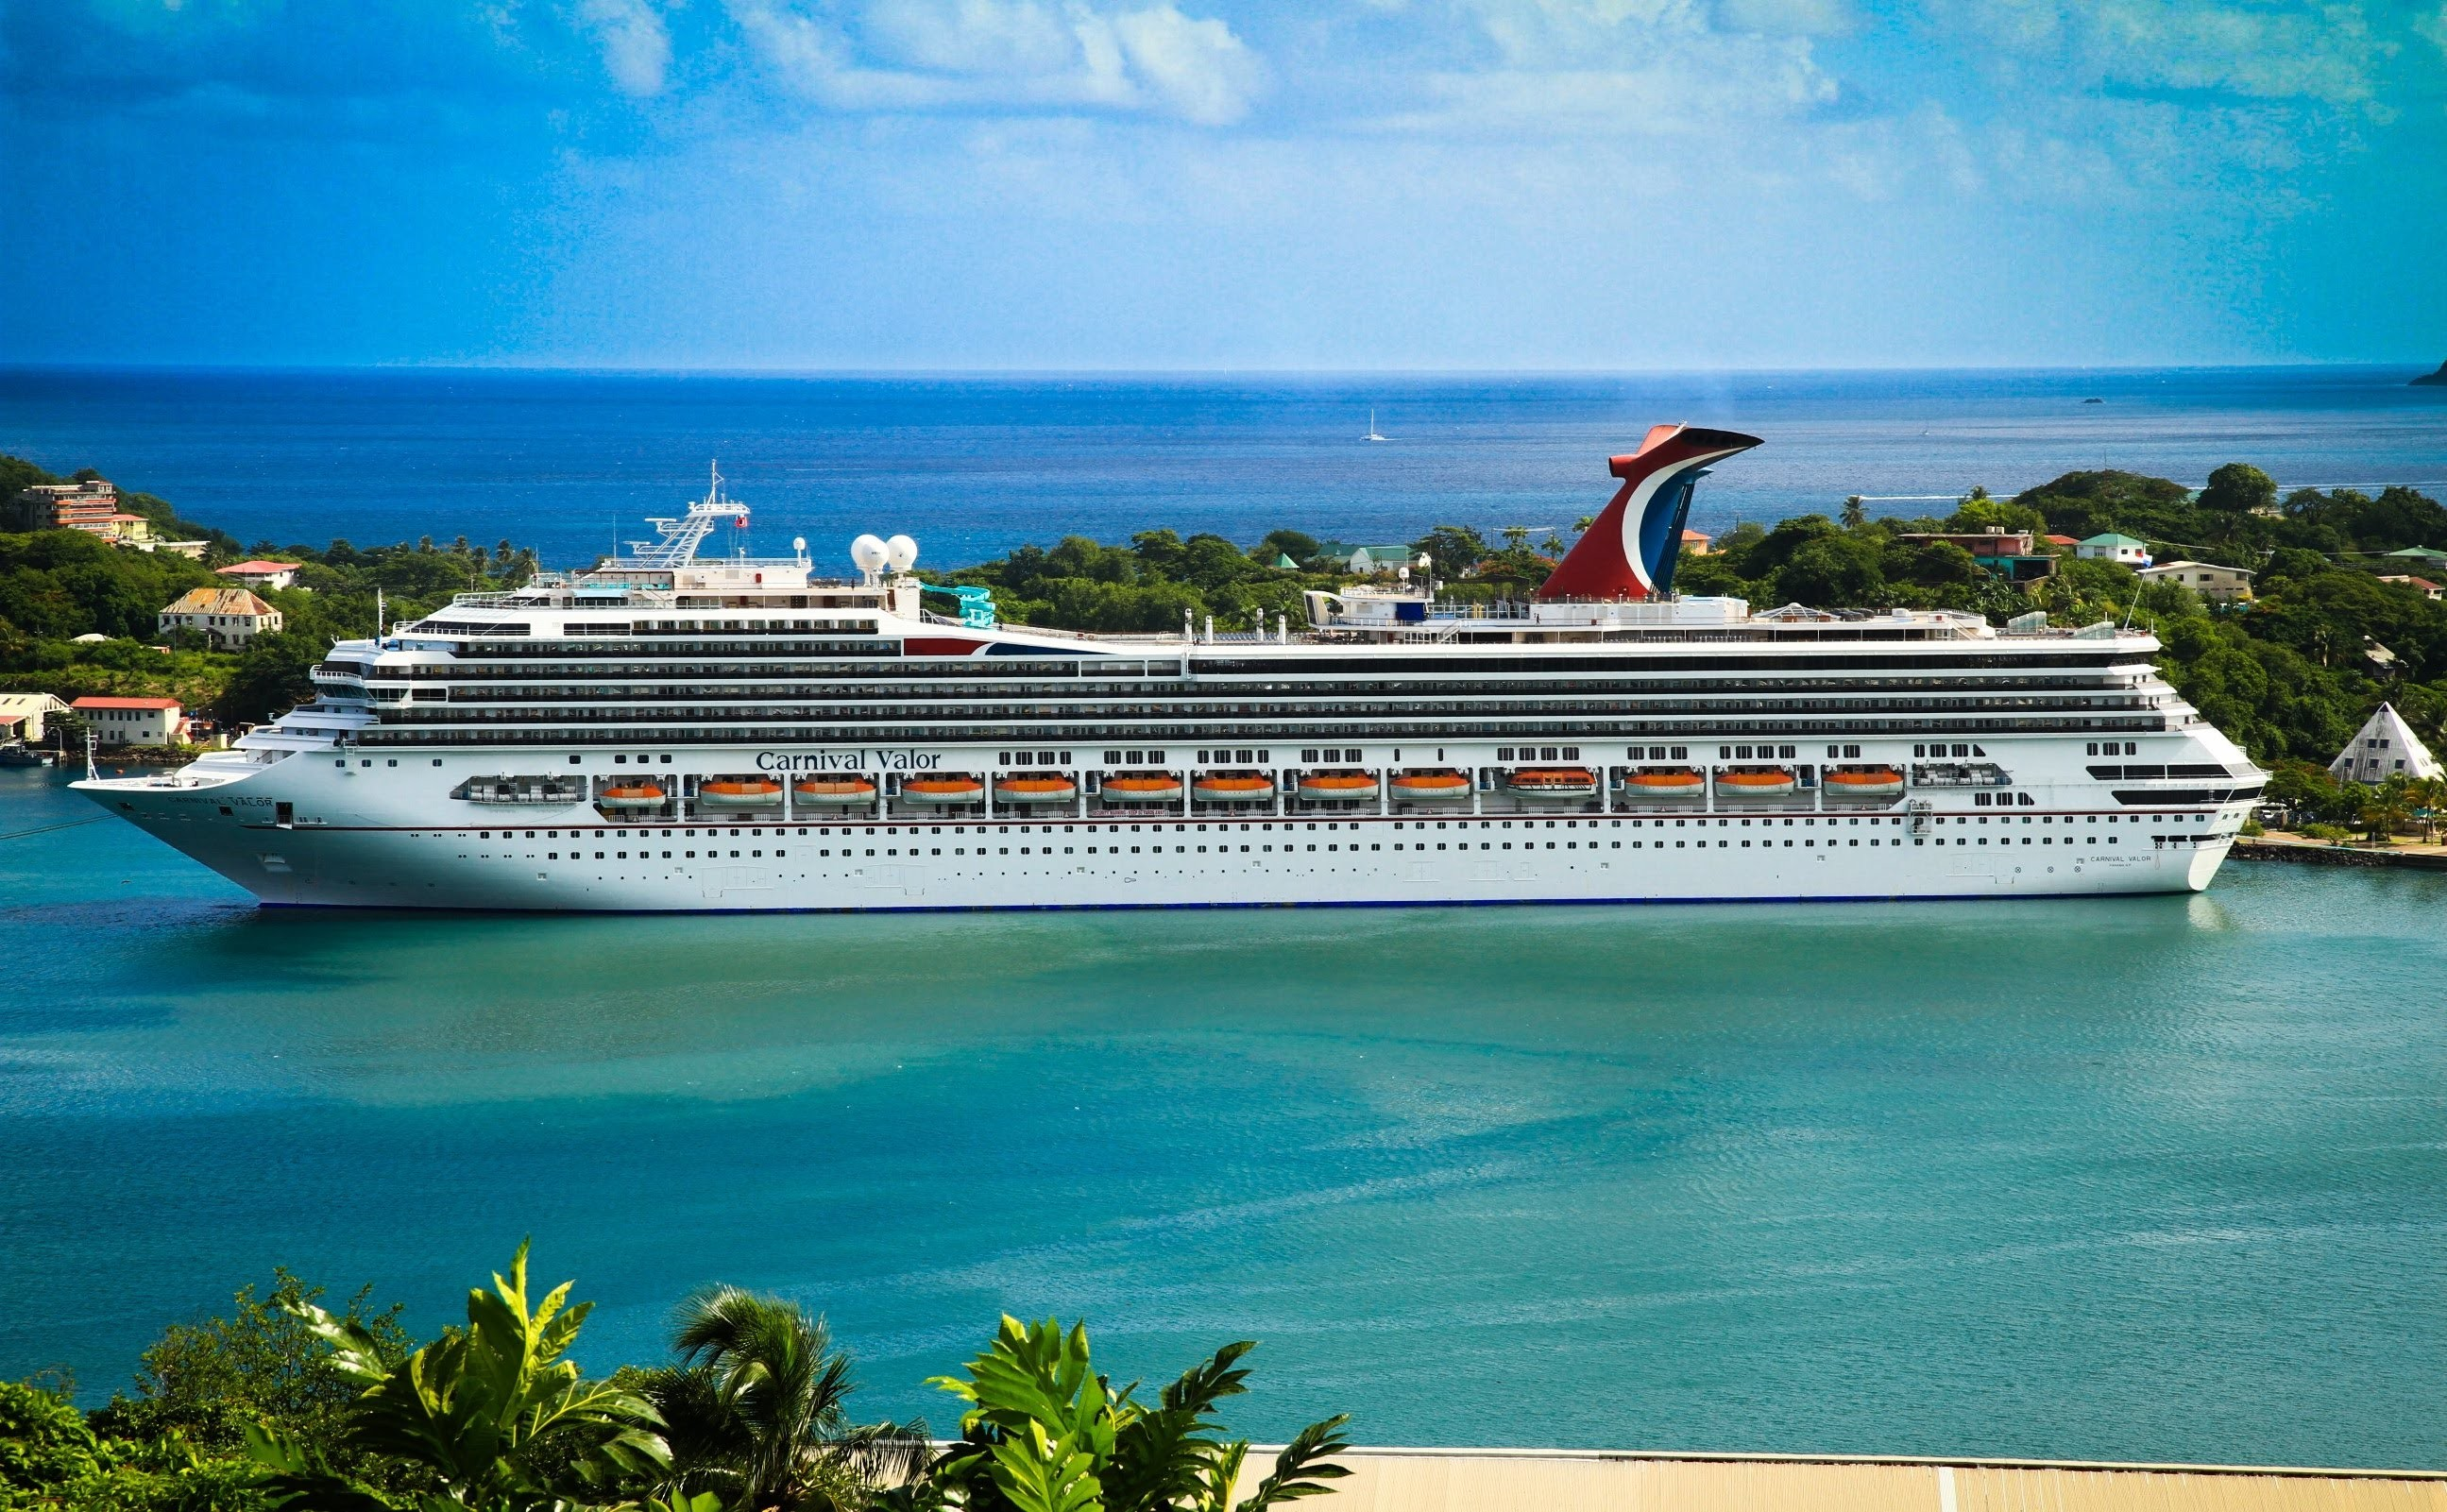 wallpapers royal caribbean cruise line